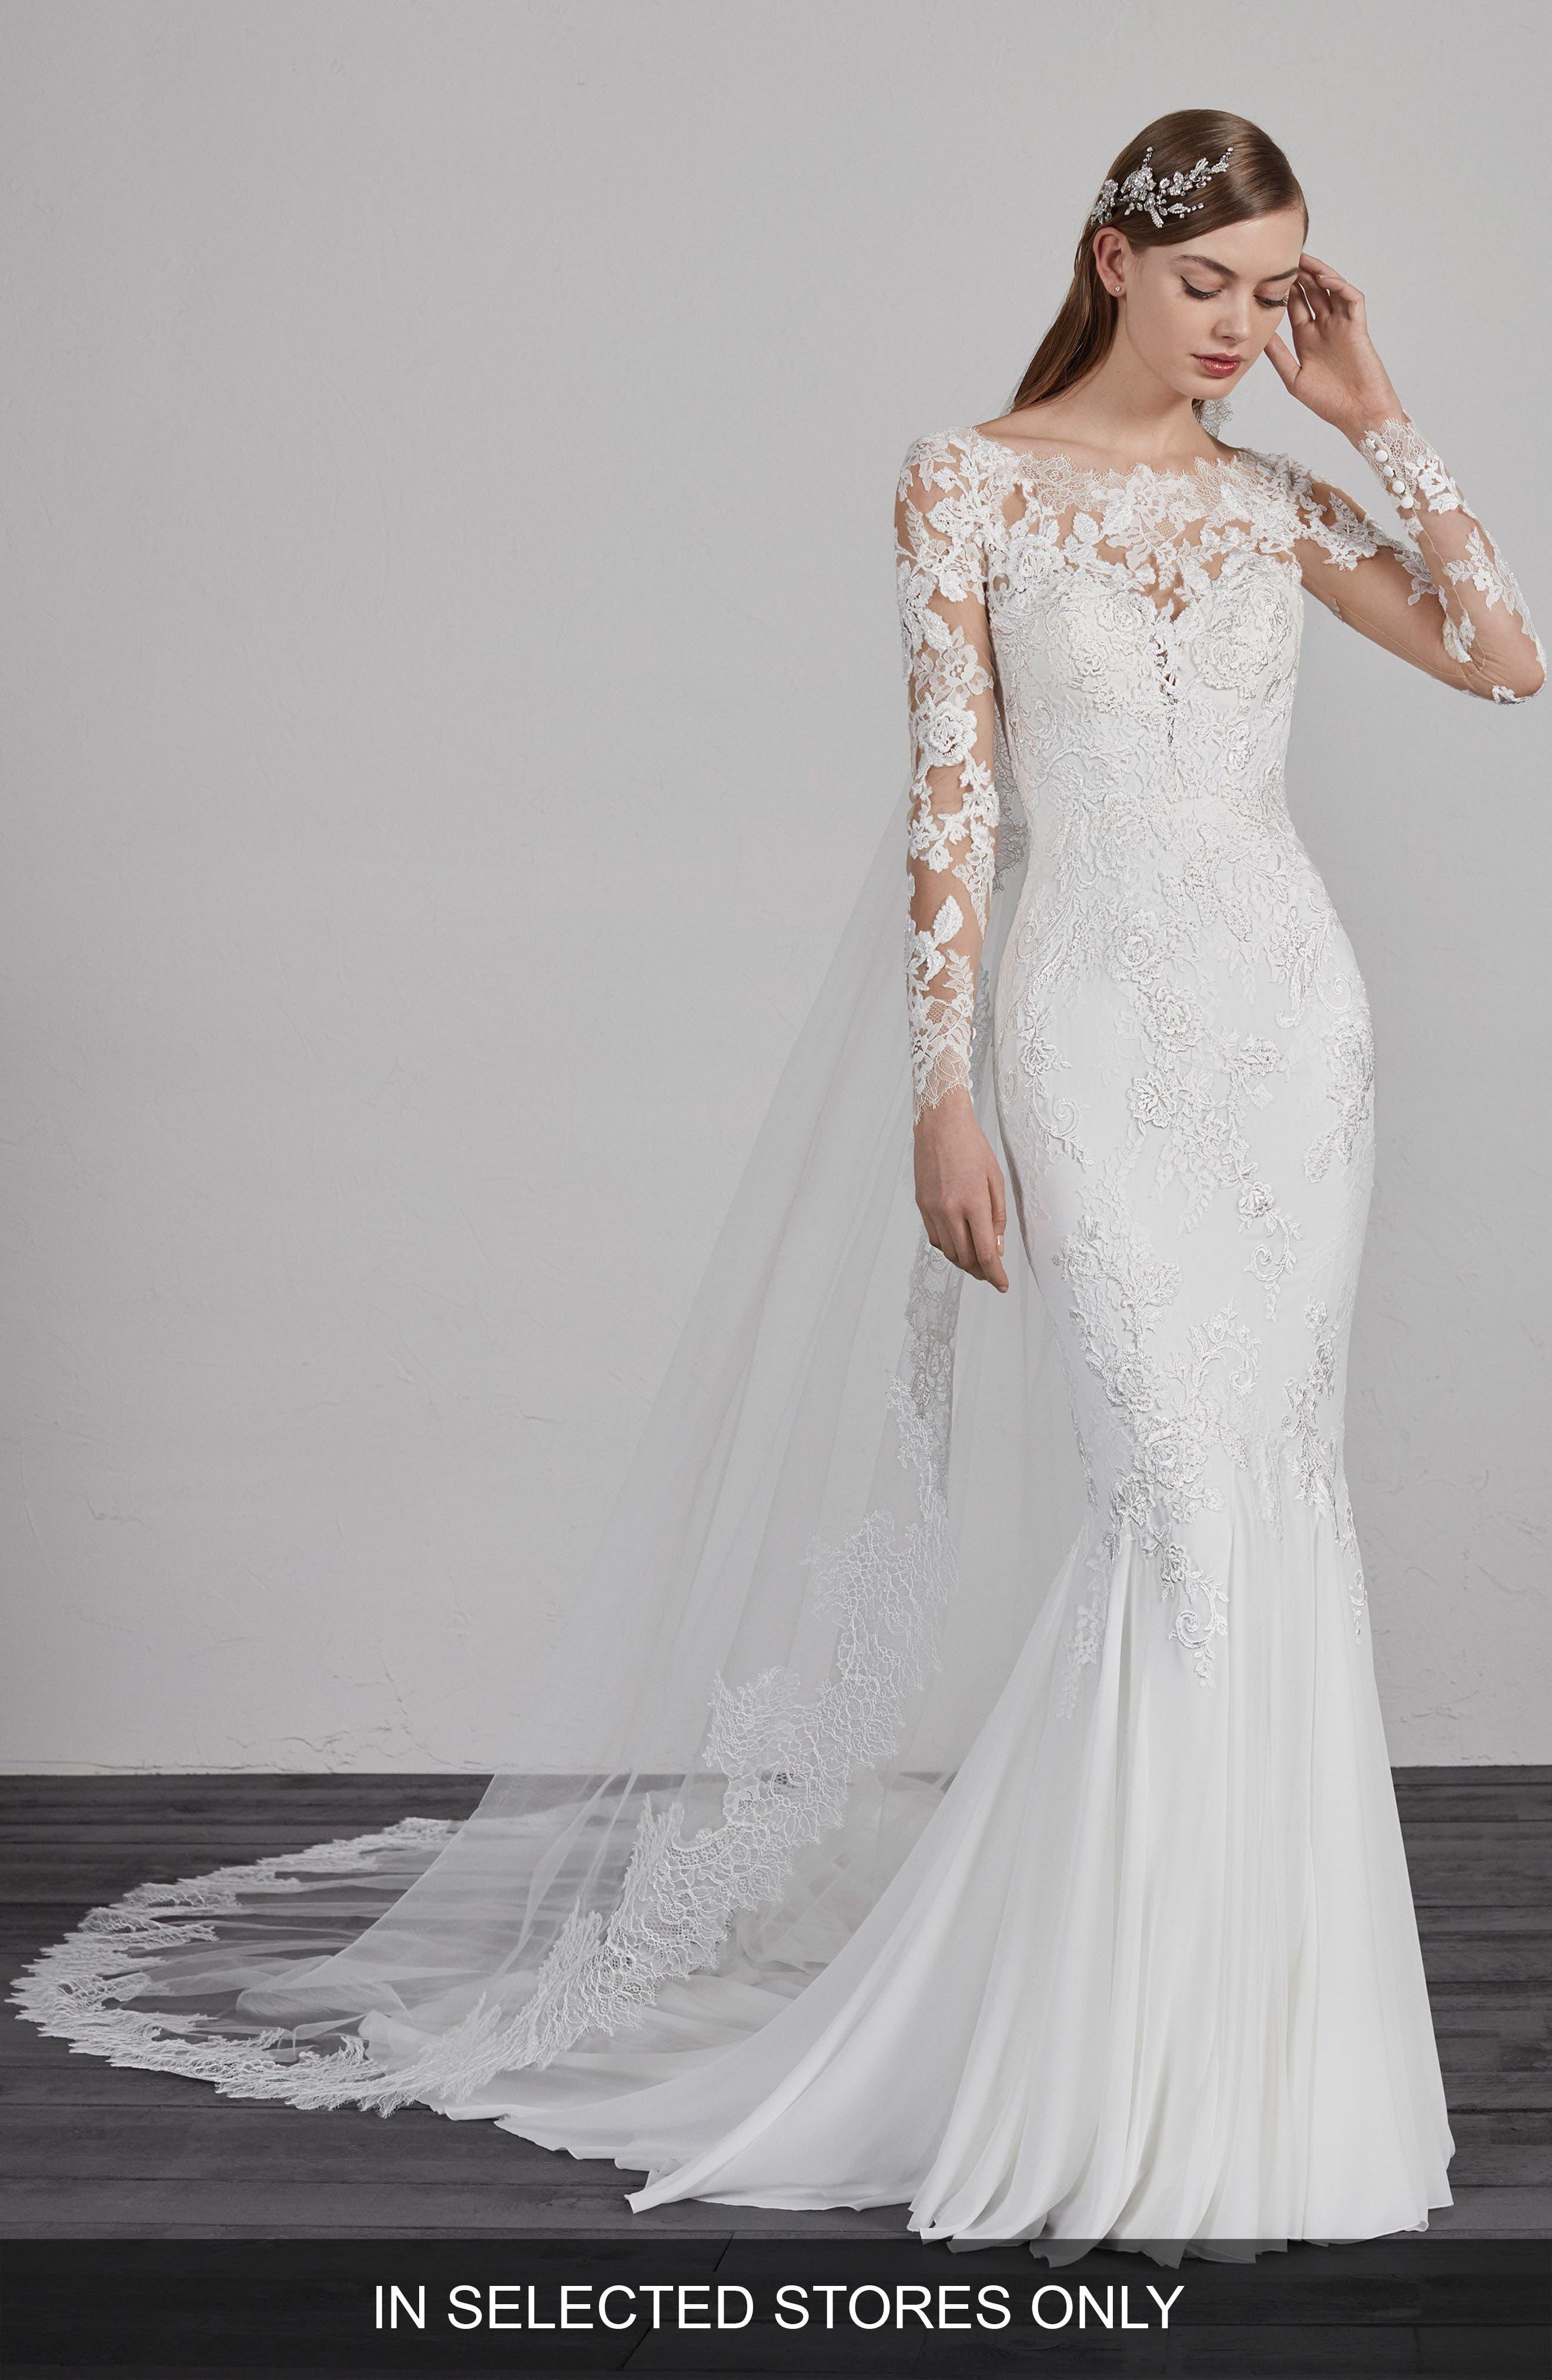 Main Image - Pronovias Esperanza Illusion Lace Mermaid Gown